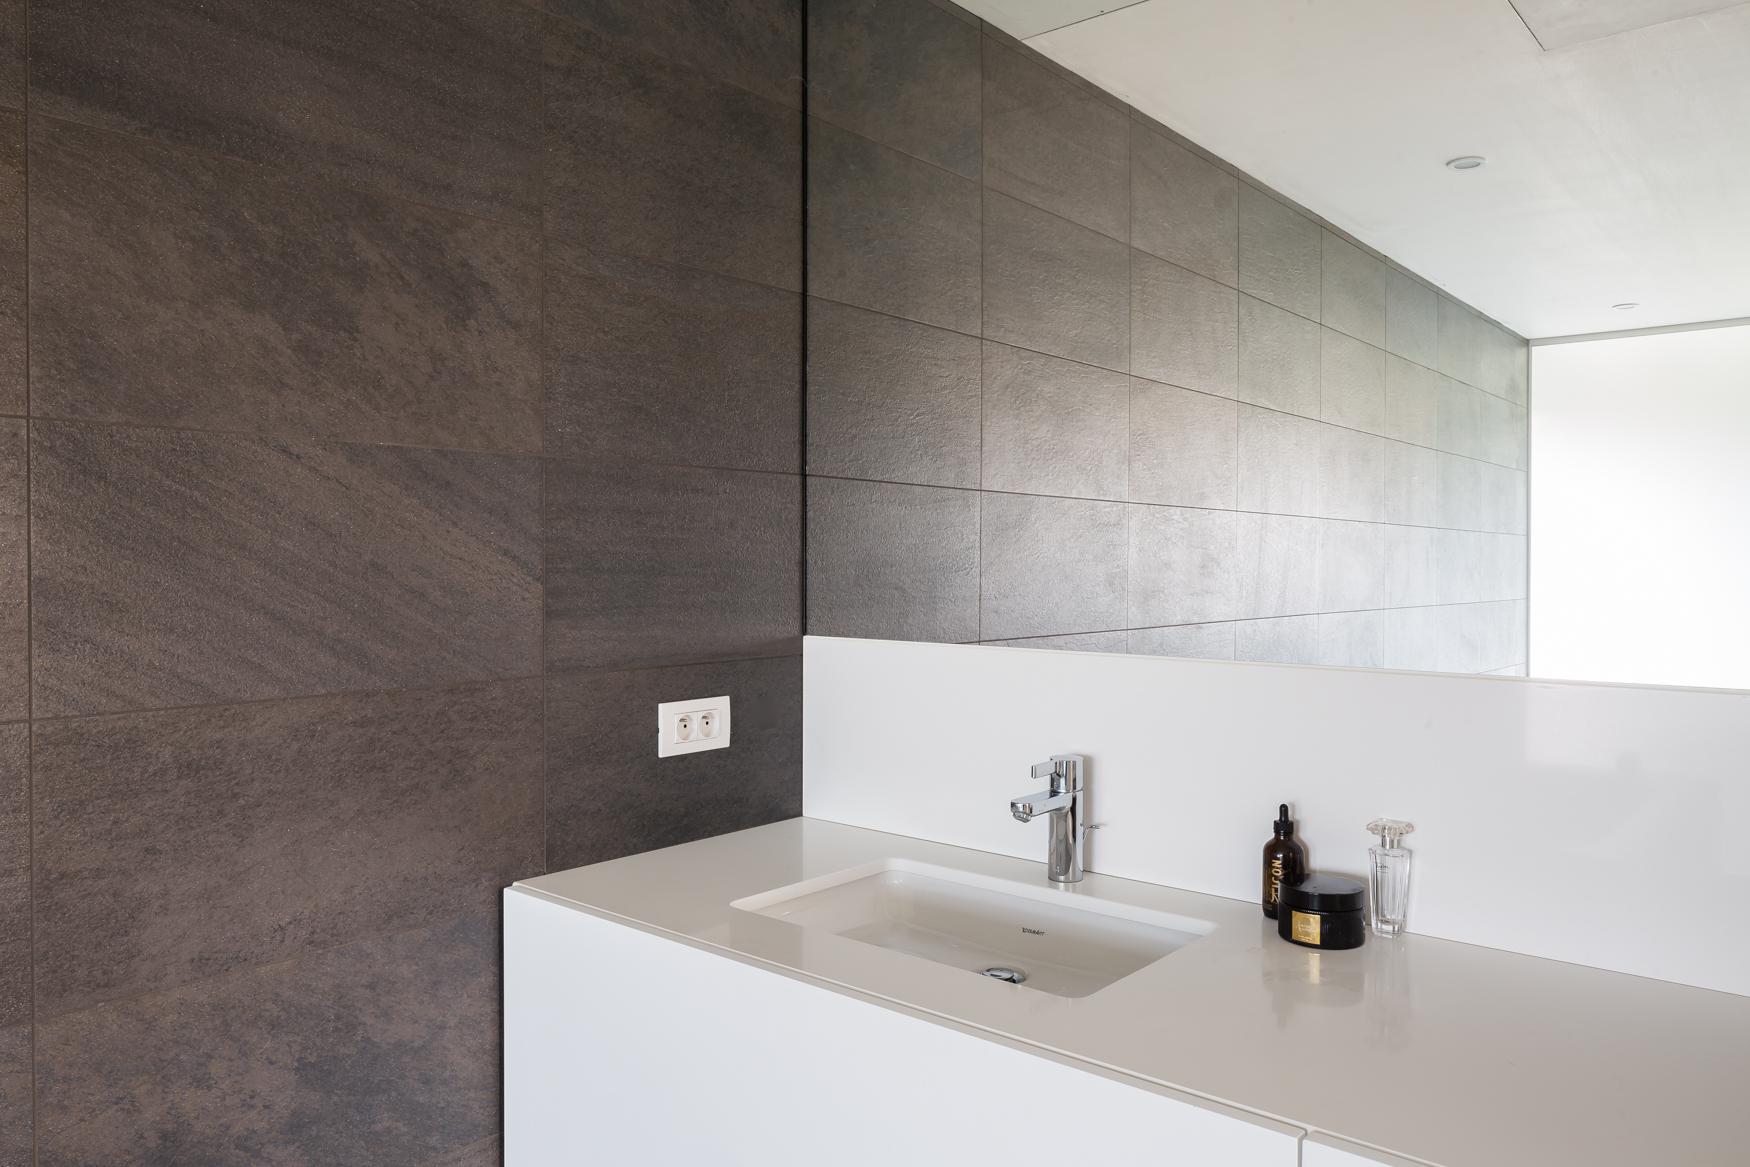 Composiet badkamer meubel blad interieur meubilair idee n - Foto badkamer meubels ...